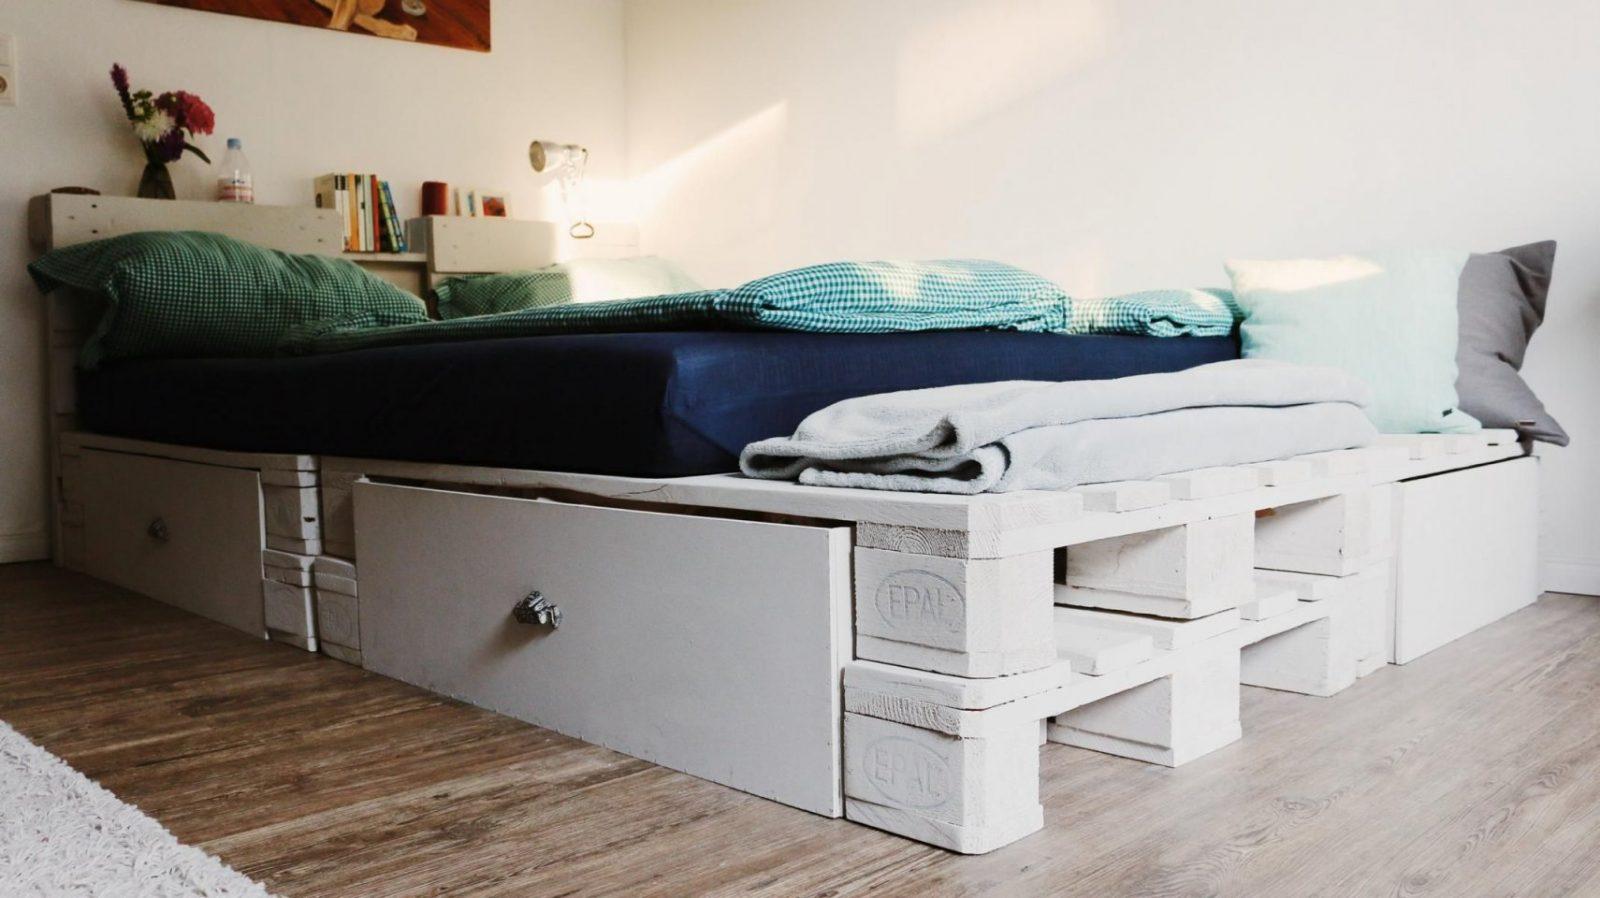 ᐅᐅ Palettenbett Selber Bauen Europaletten Bett Diy Anleitung Shop von Palettenbett 140X200 Selber Bauen Photo